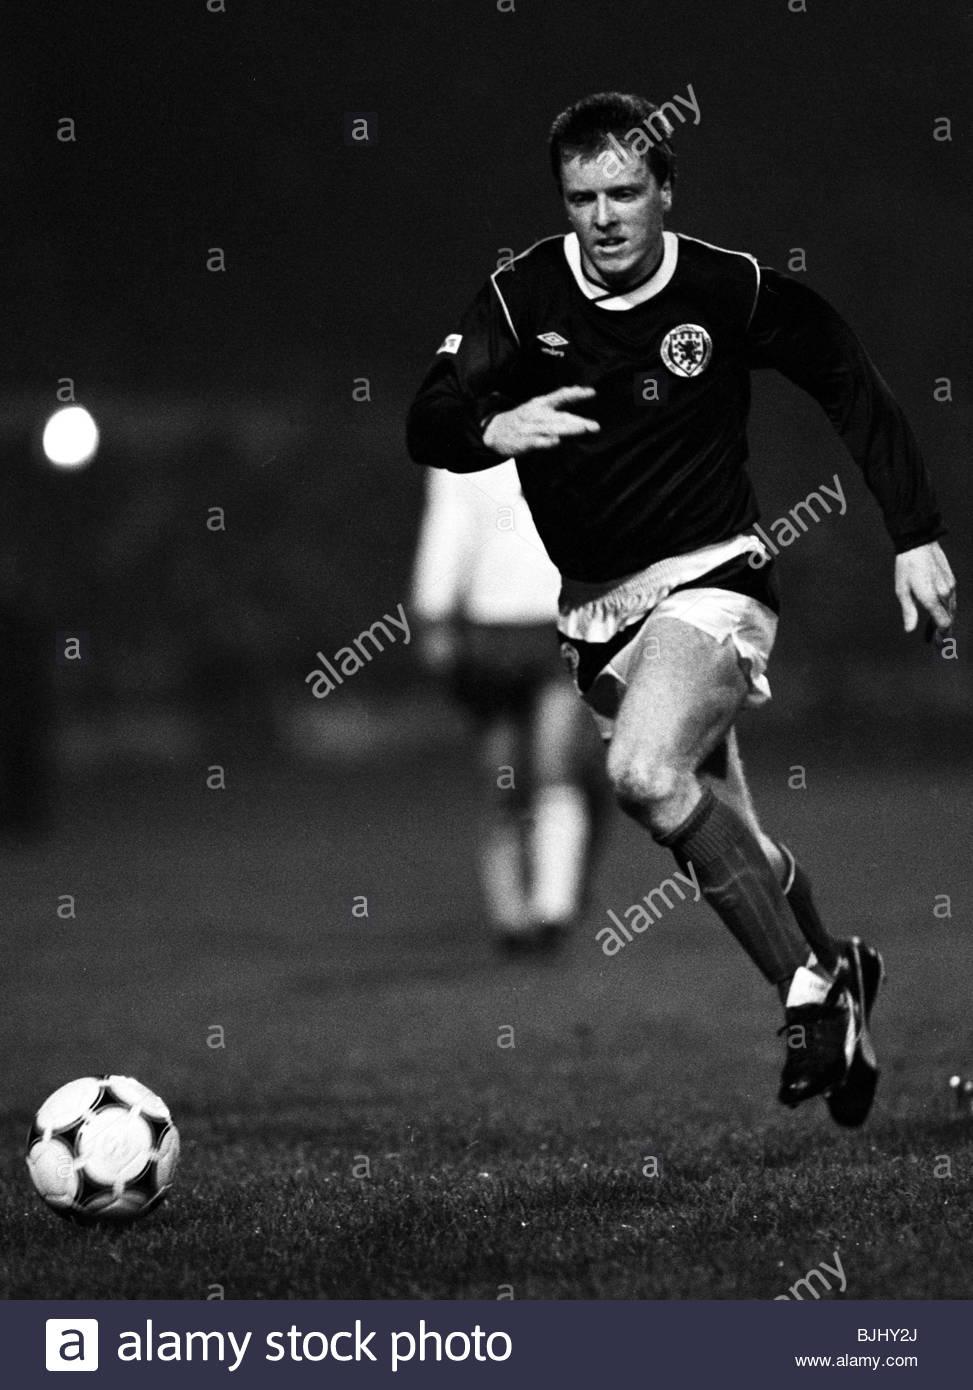 16/10/85 INTERNATIONAL FRIENDLY SCOTLAND v EAST GERMANY (0-0) HAMPDEN - GLASGOW Steve Nicol in action for Scotland. - Stock Image